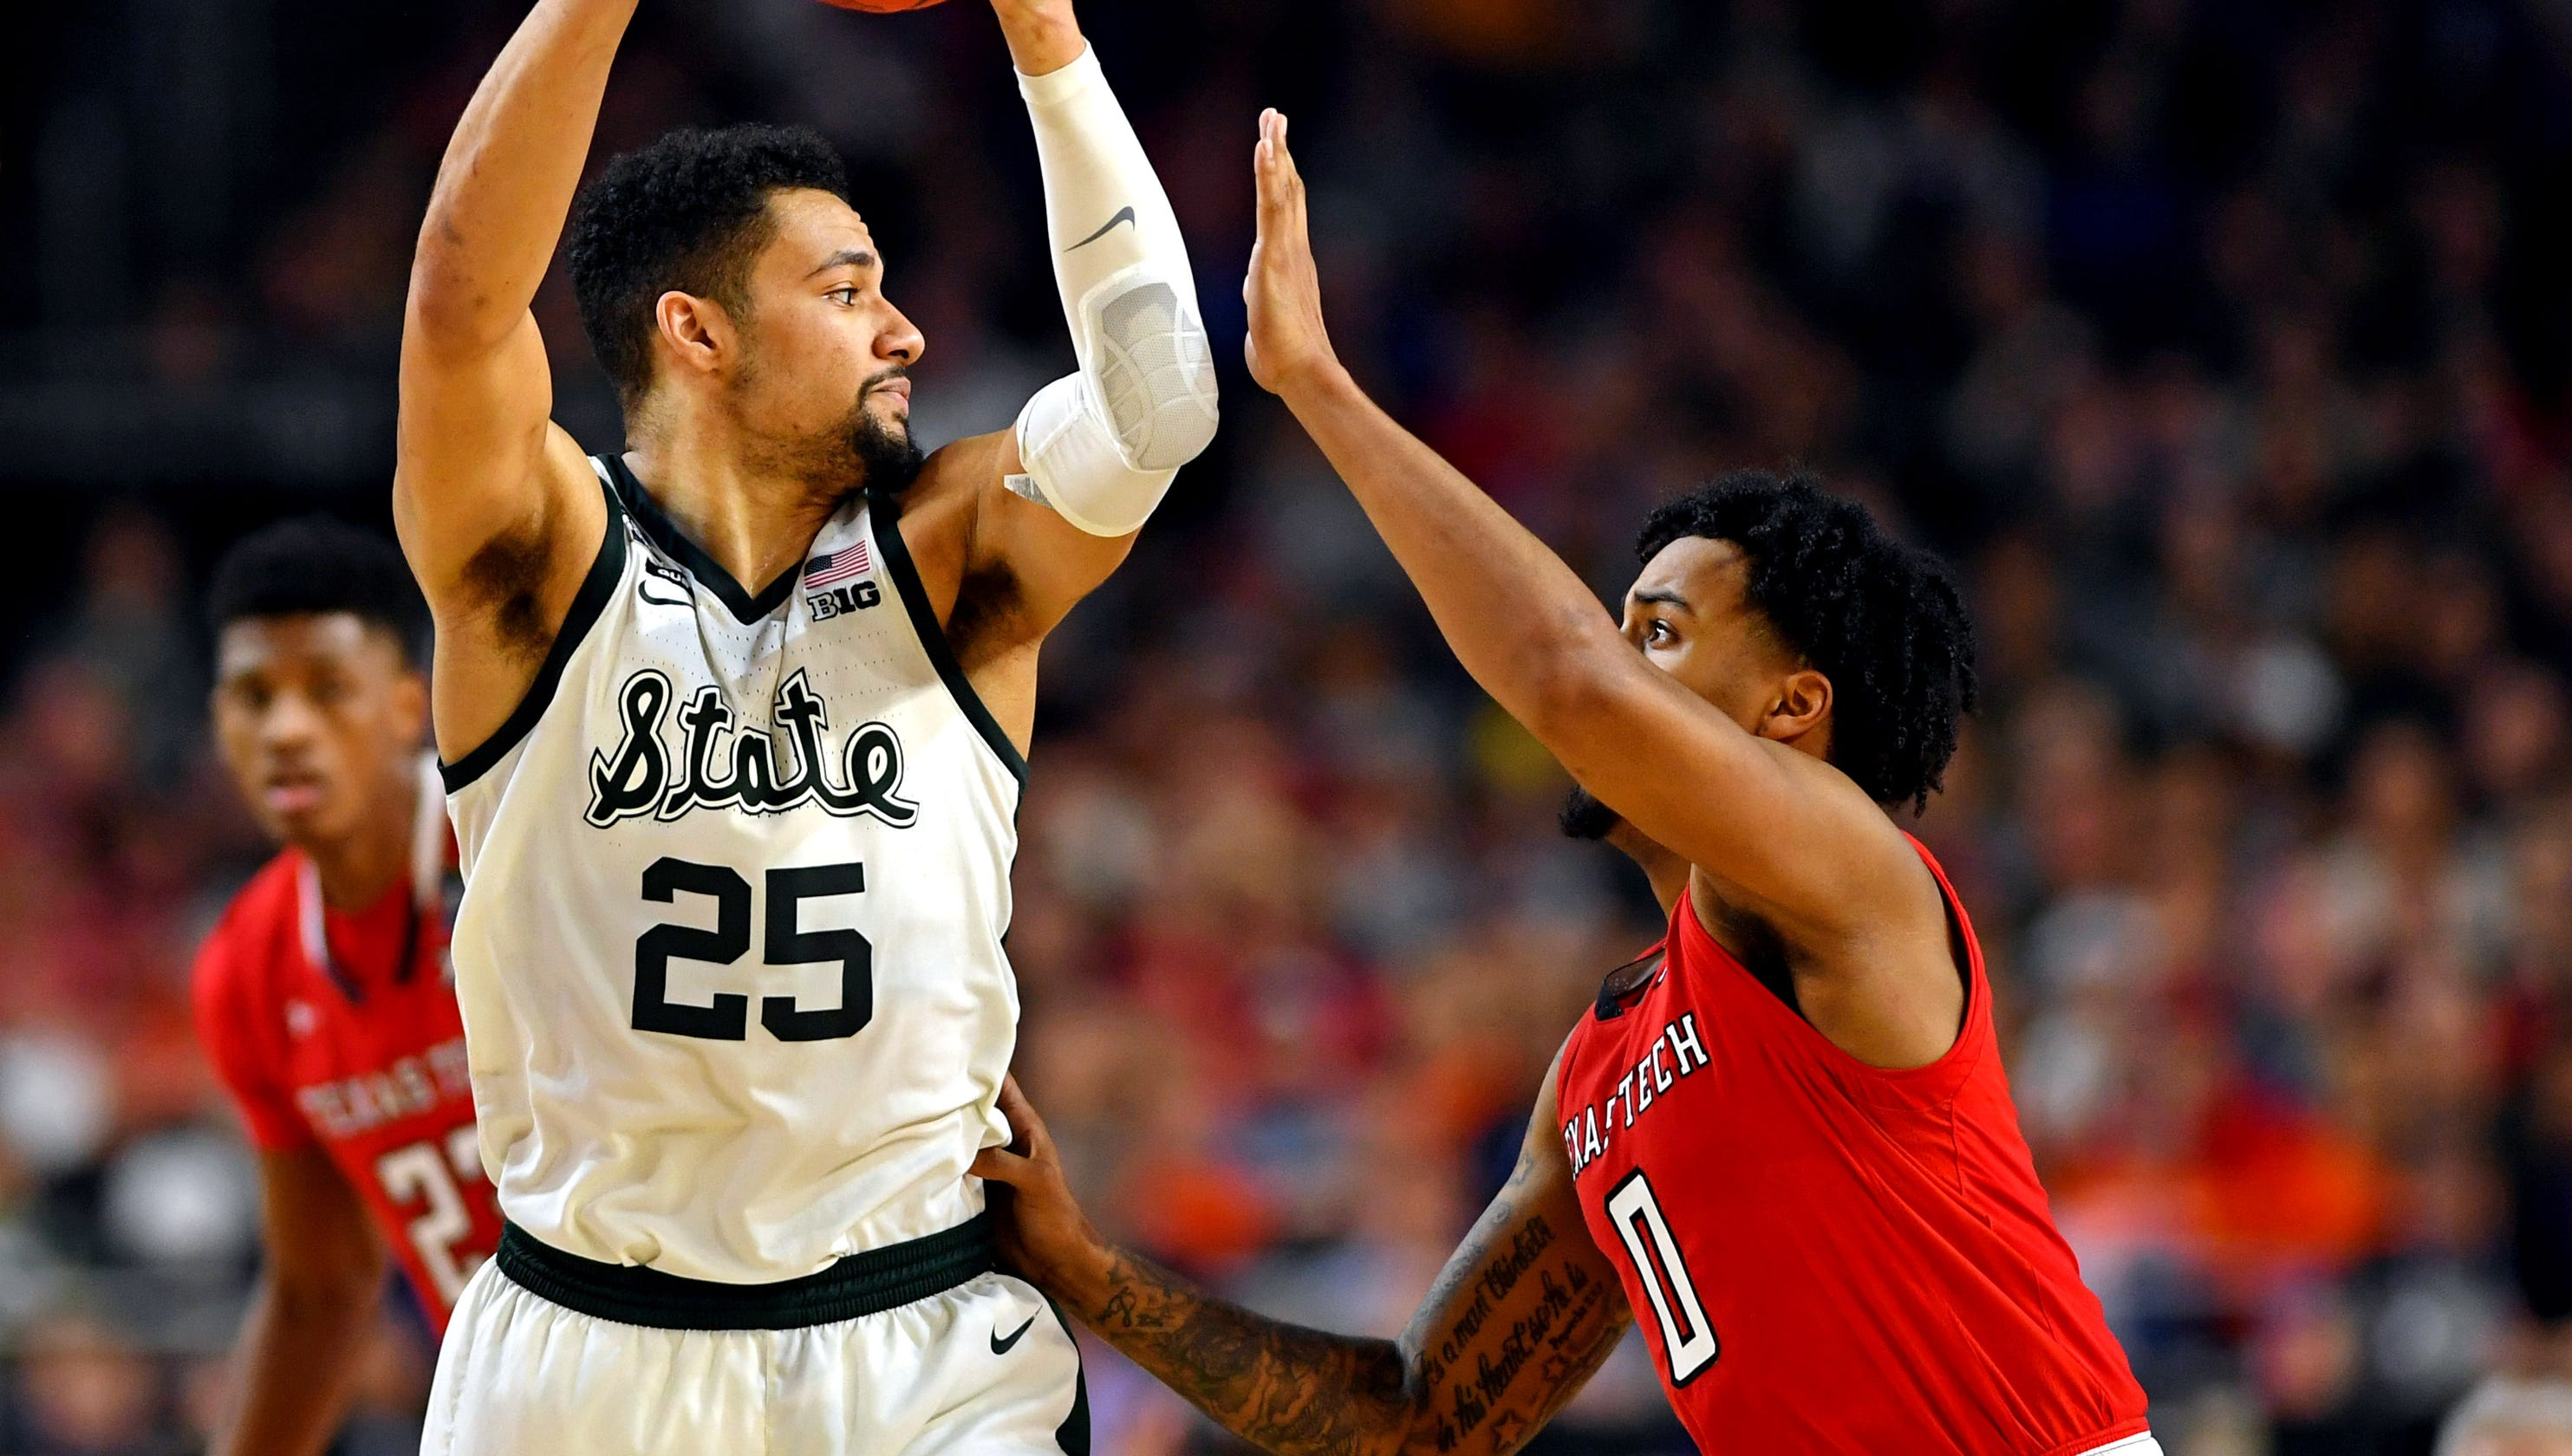 2019 Ncaa Tournament Live Updates College Basketball: Final Four Updates: MSU Vs. Texas Tech In The 2019 NCAA